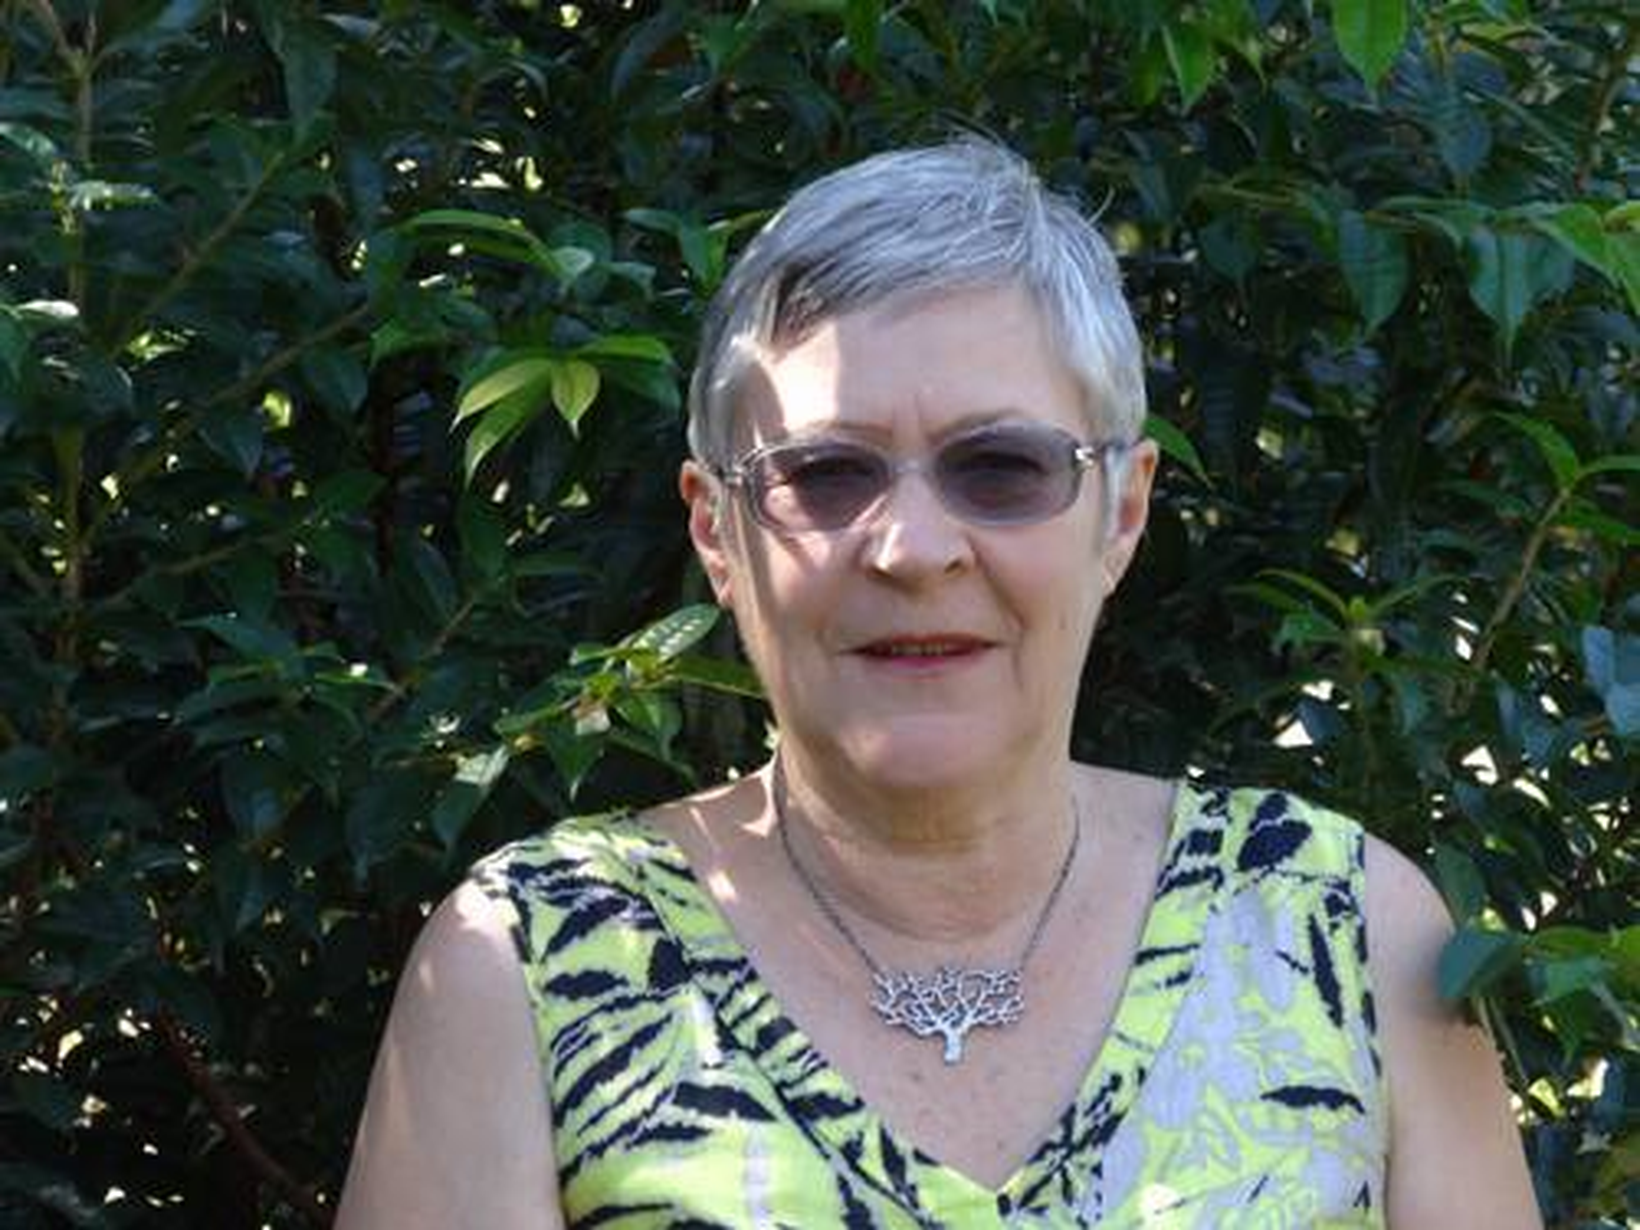 Celia from Wellington, New Zealand